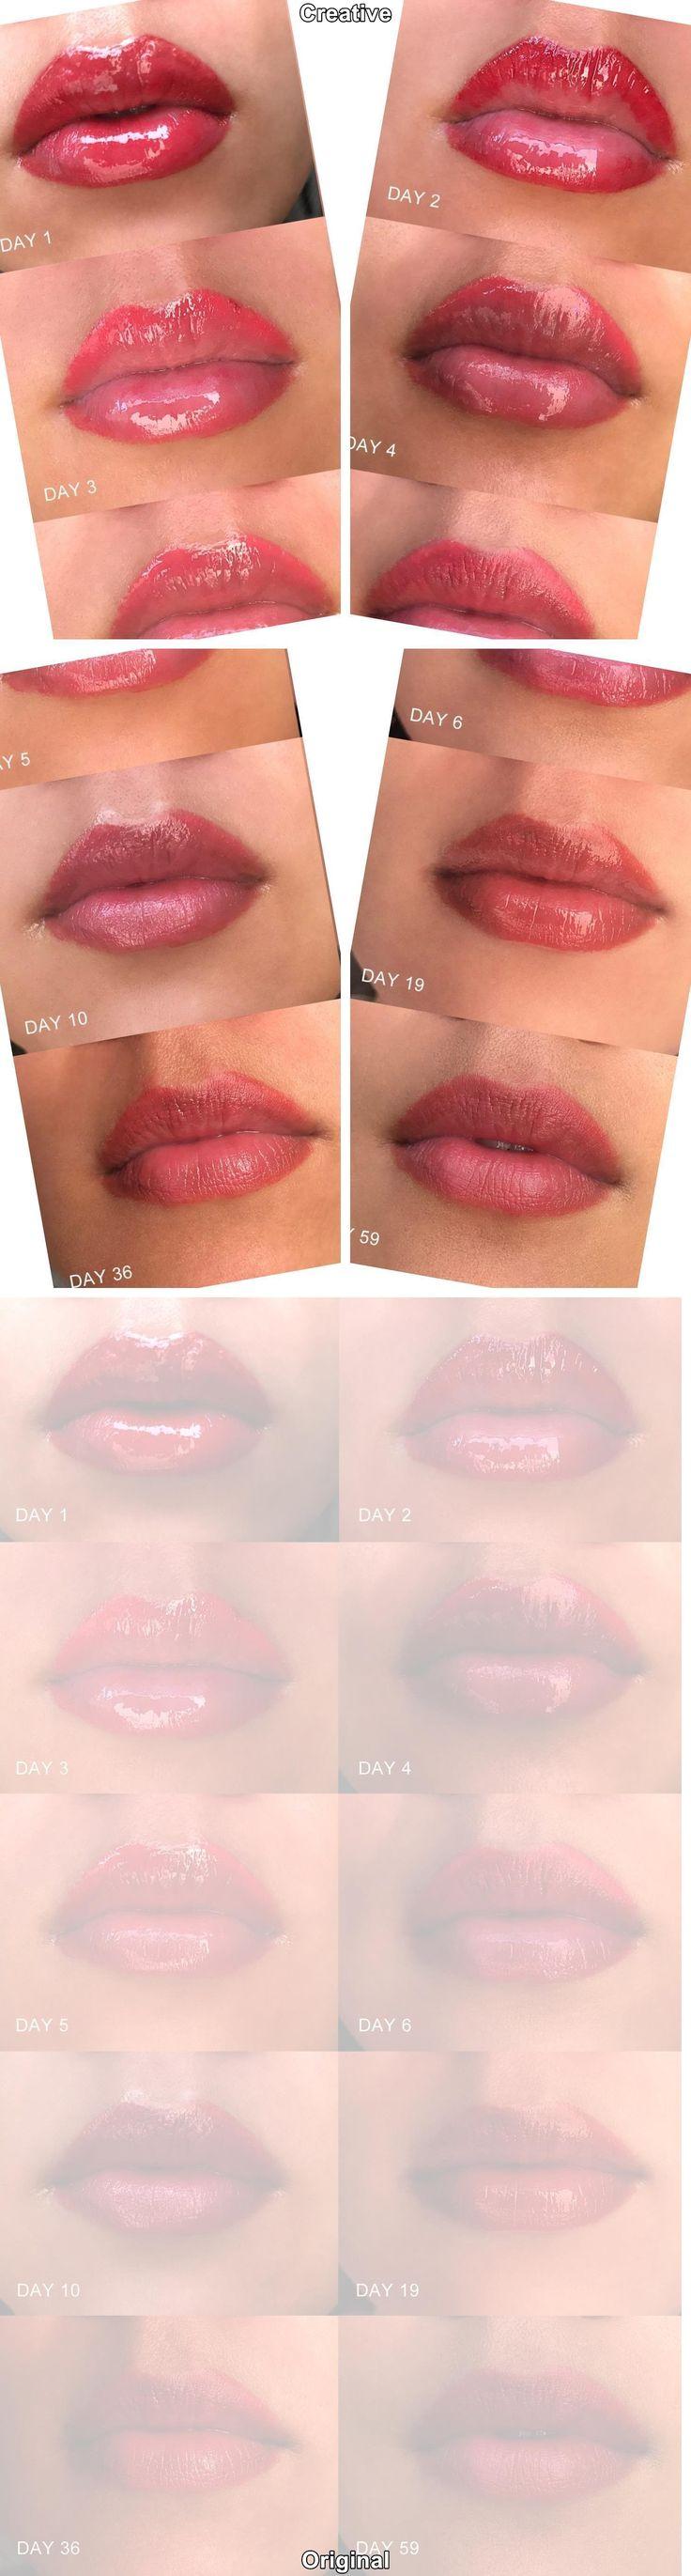 Lipstick Shades | Gloss To Matte Lipstick | Moisturizing Lip Liner